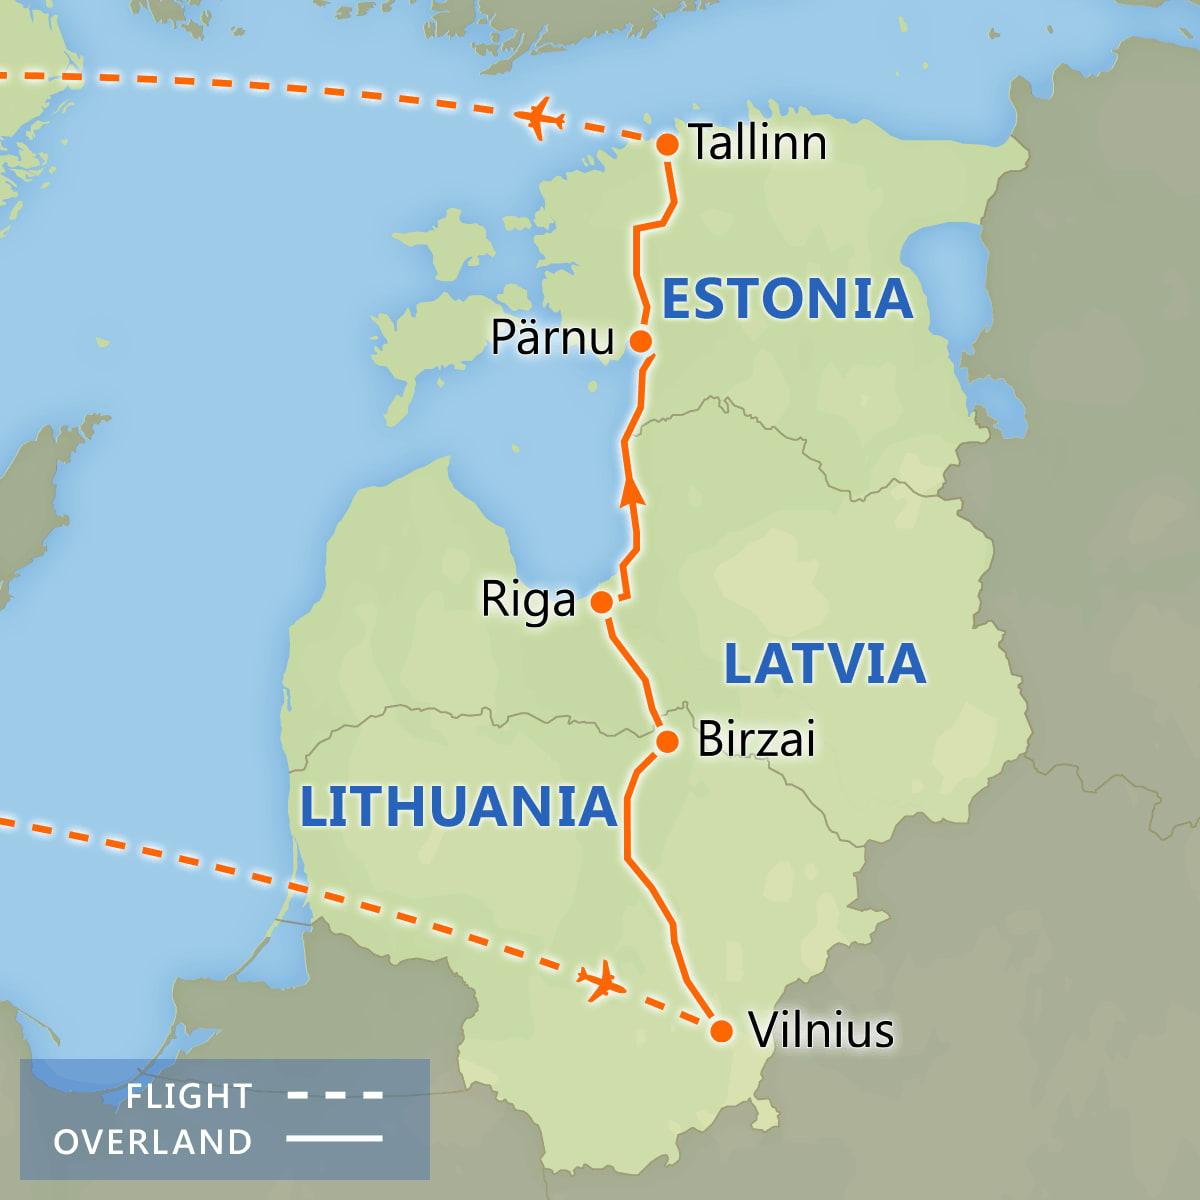 Highlights of the Baltics map